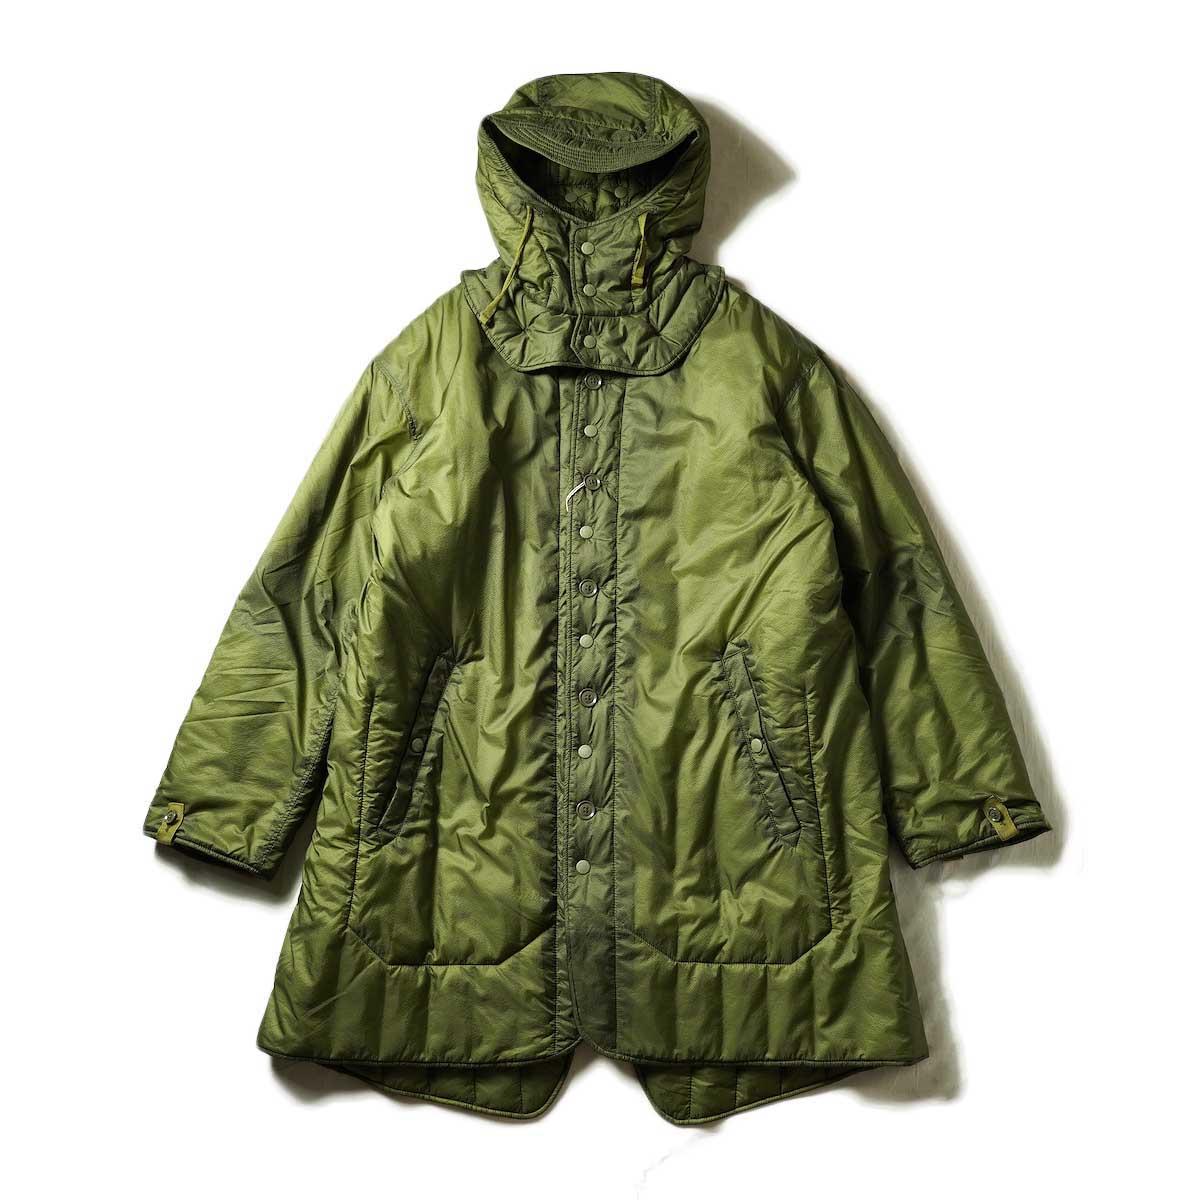 Engineered Garments / LINER JACKET - NYLON MICRO RIPSTOP (Olive)